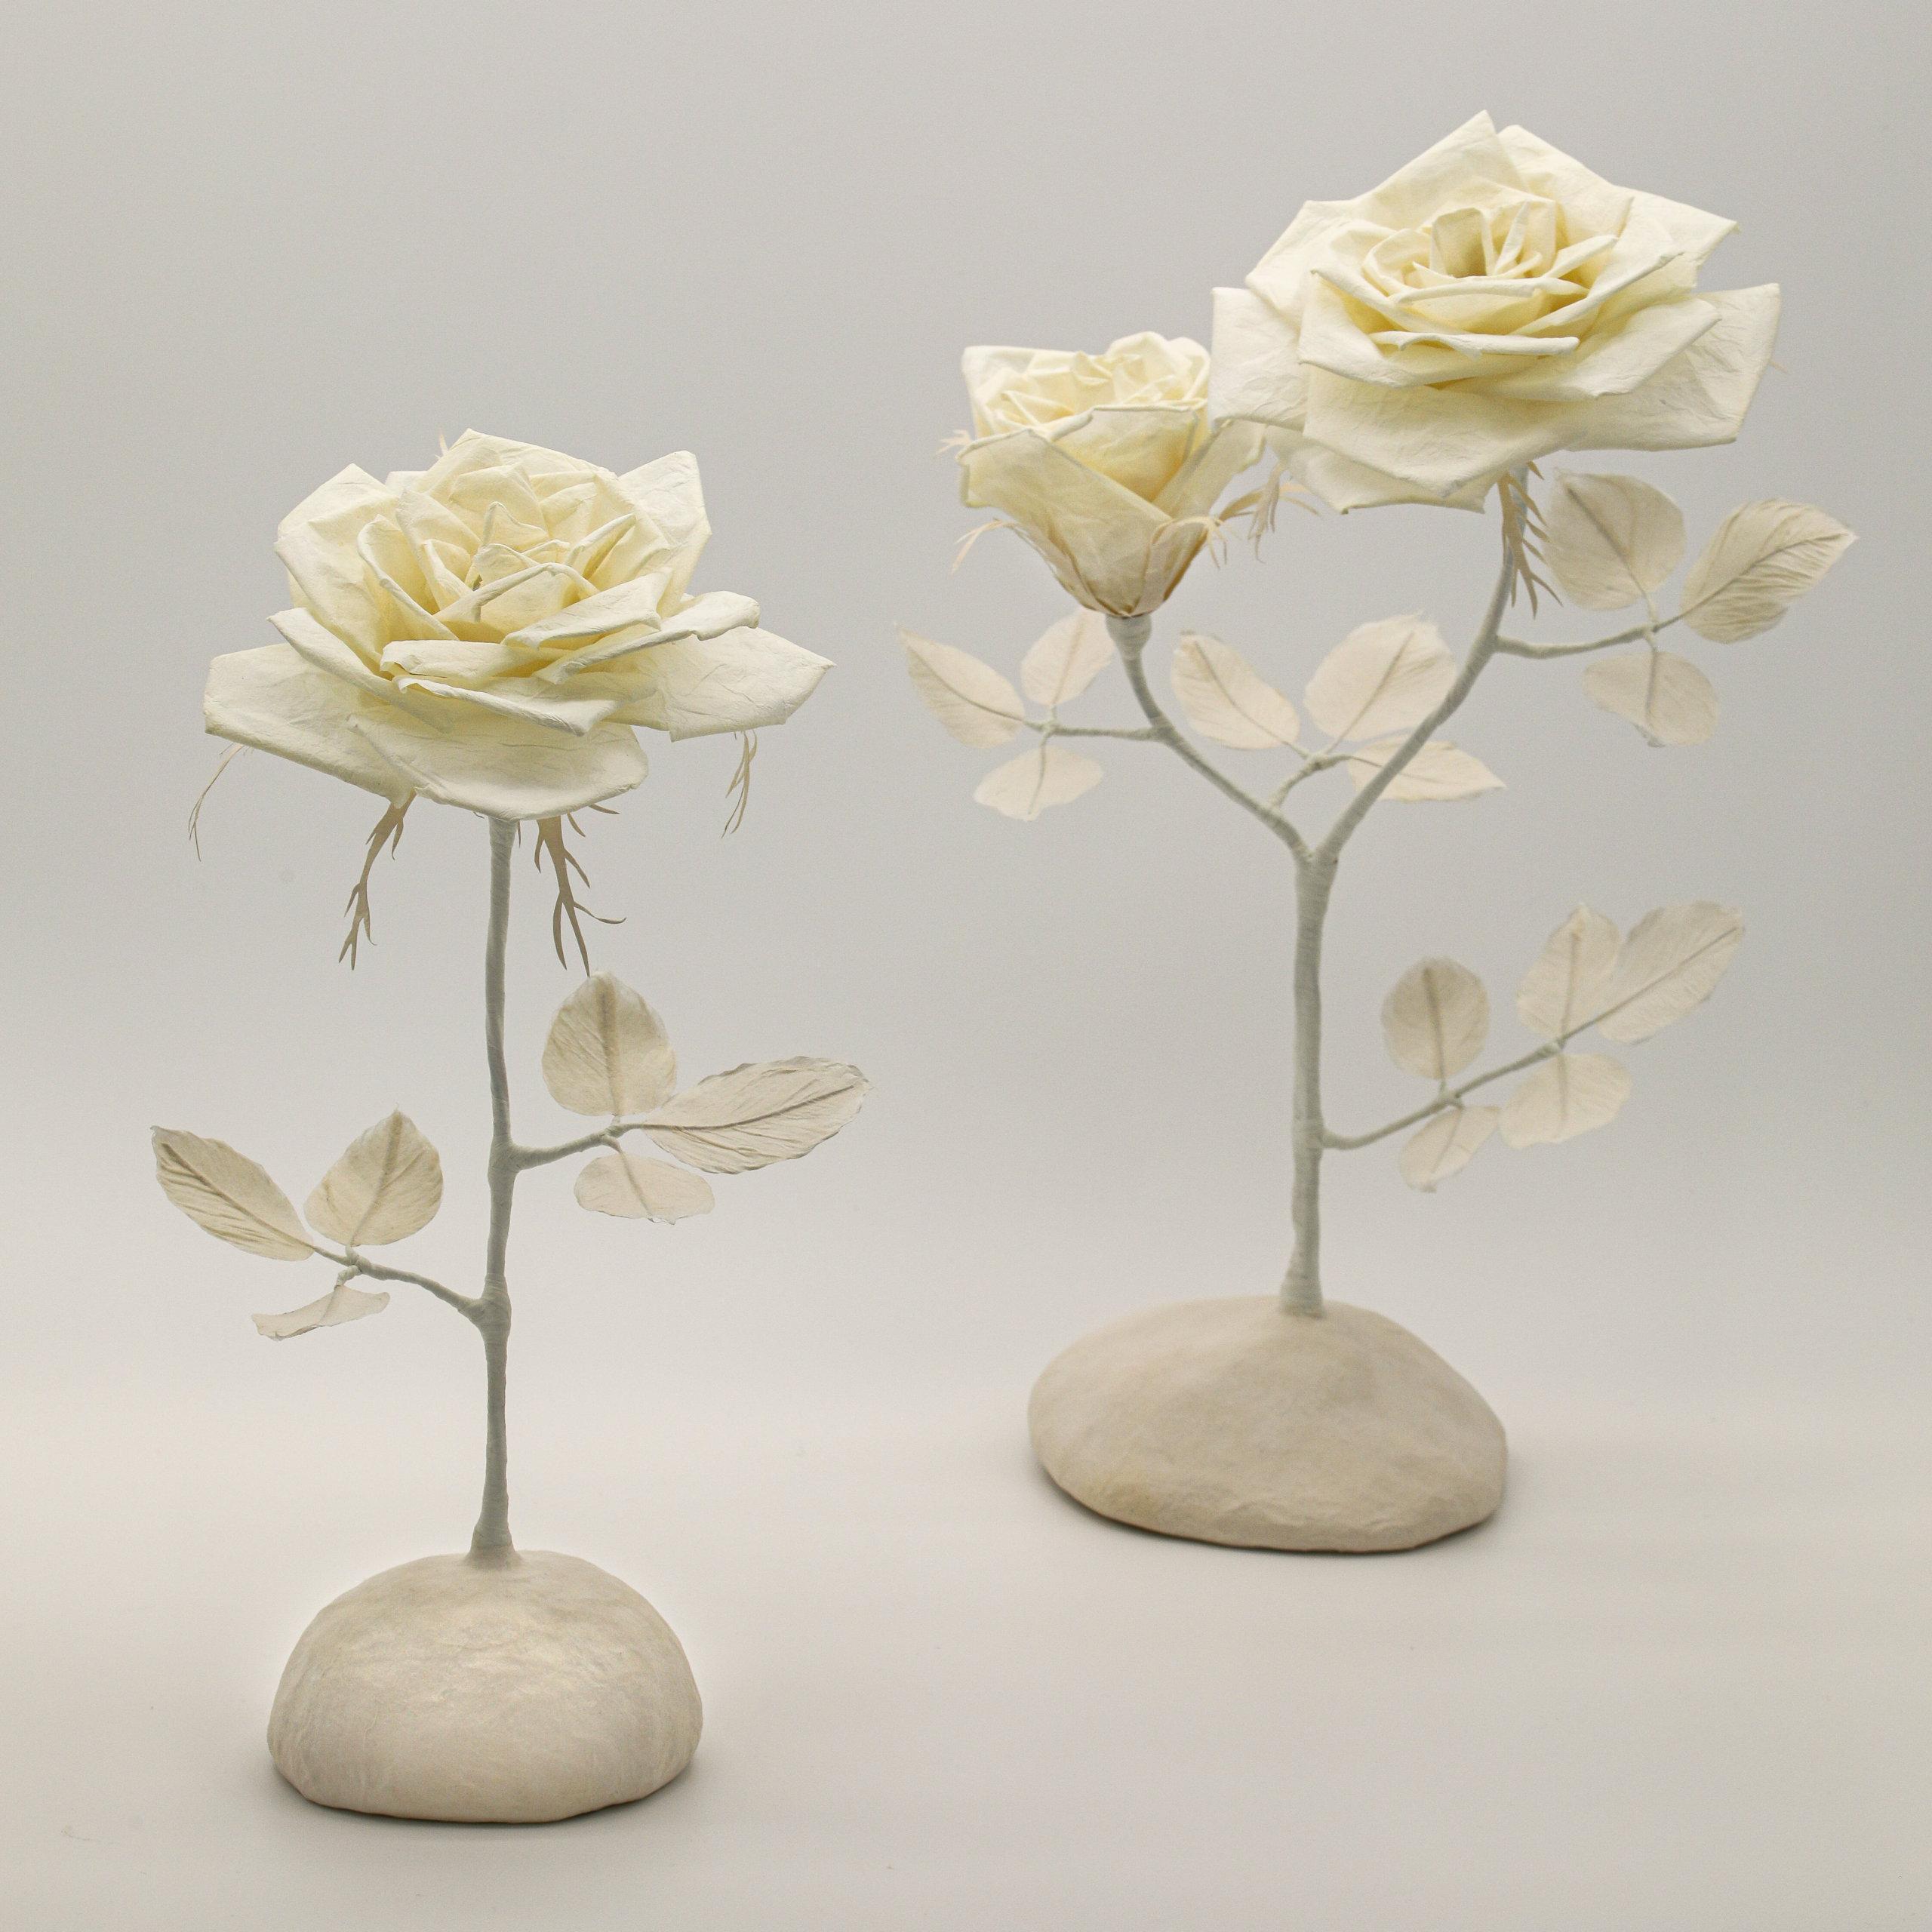 White rose 和紙の薔薇のランプ